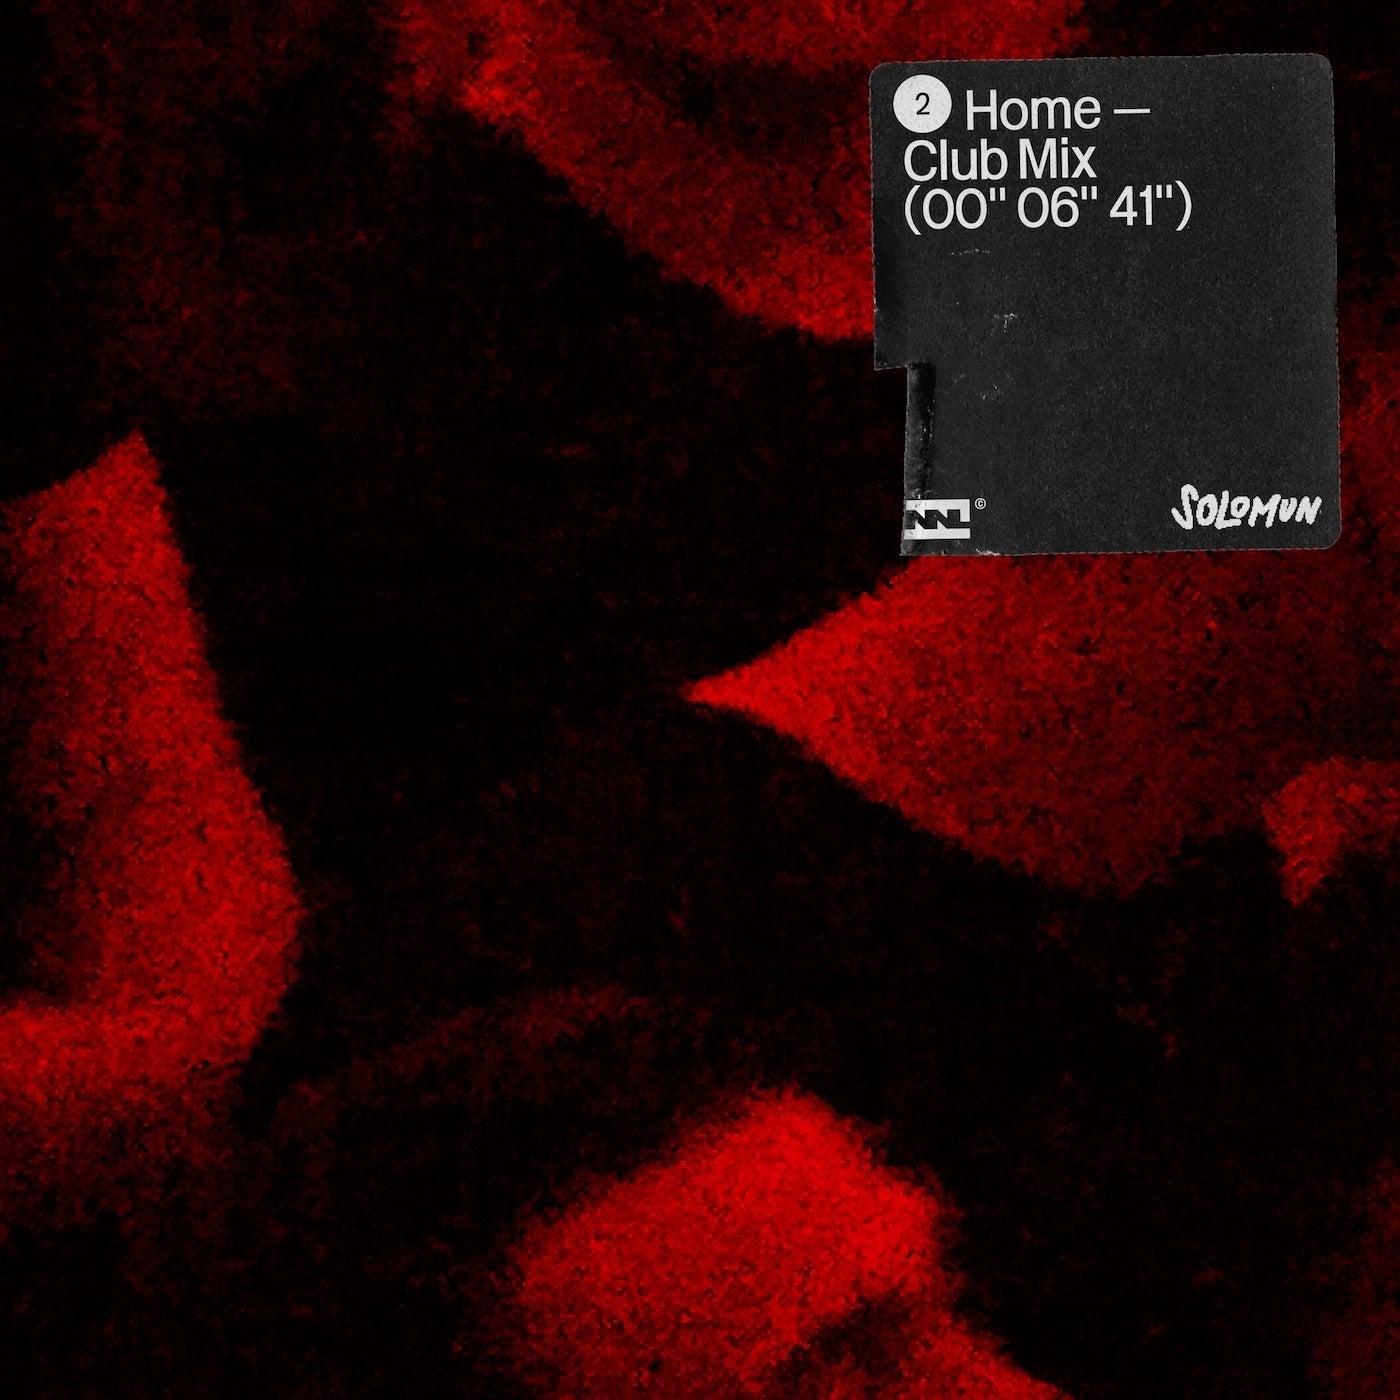 Home (Club Mix)